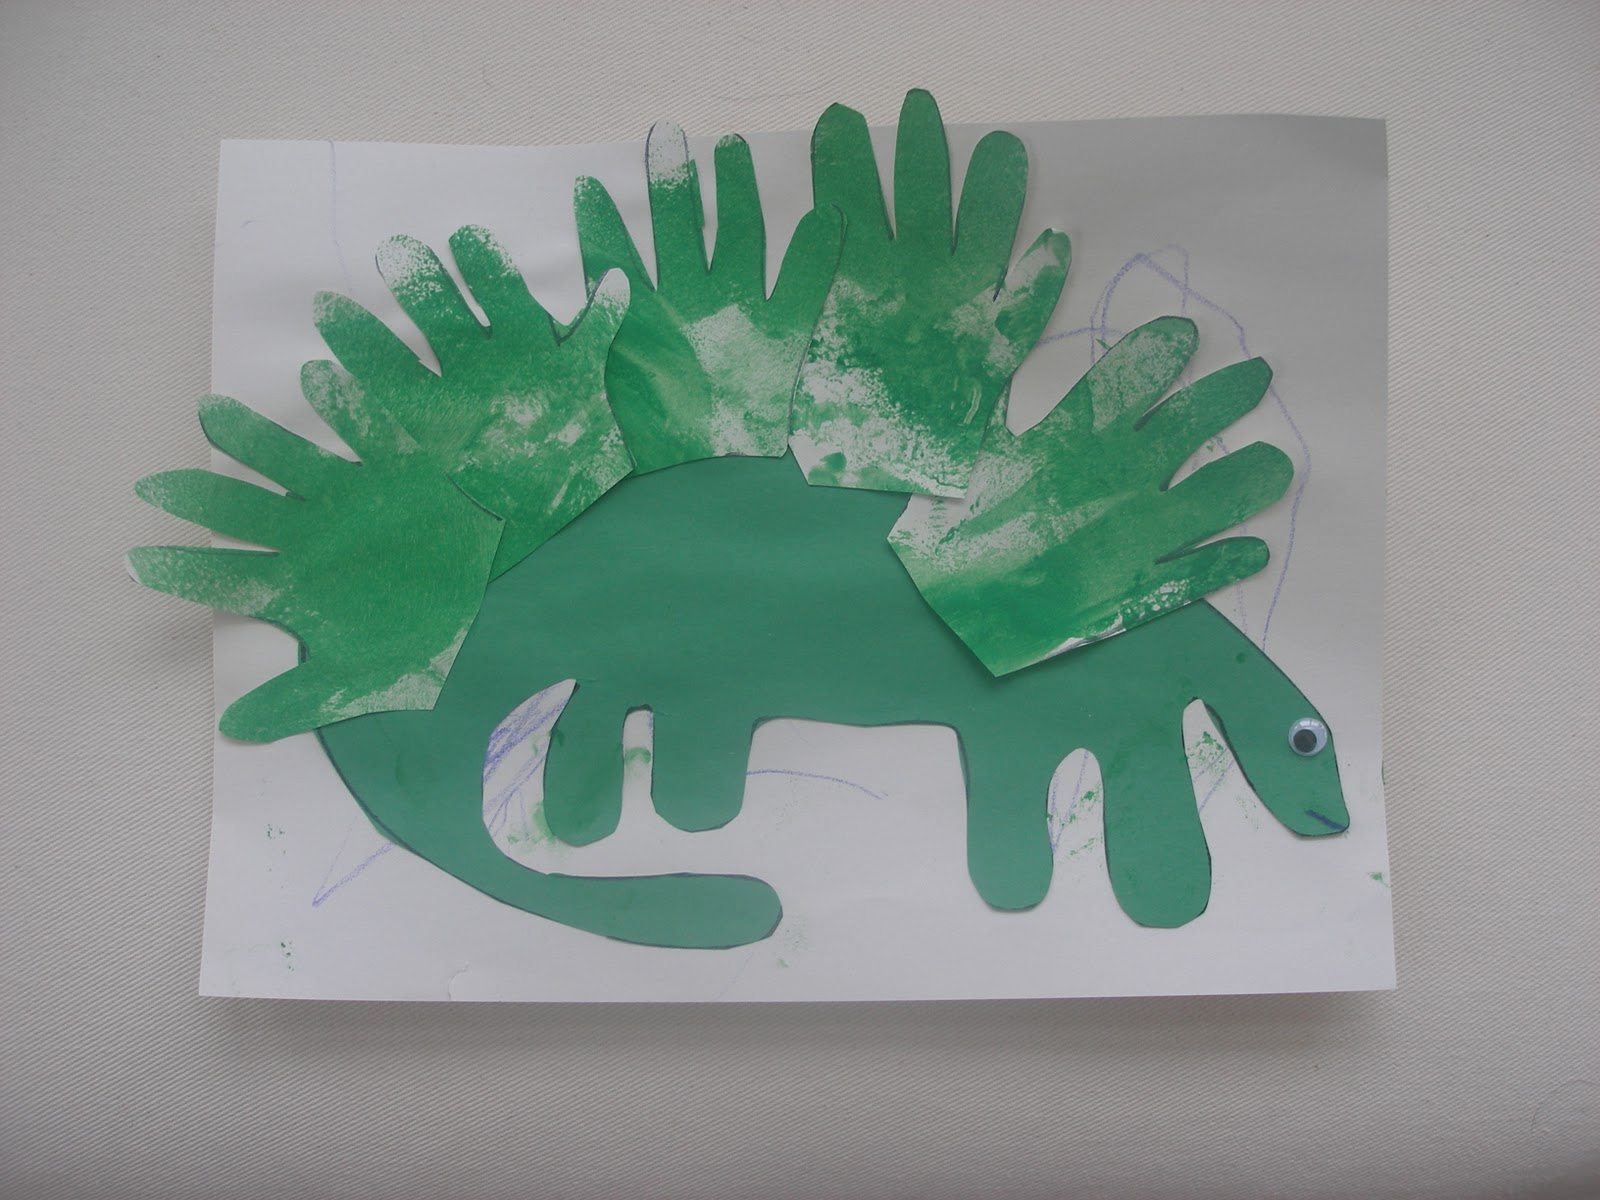 Stegosaurus Hand Print Craft & Stegosaurus Hand Print Craft | Preschool Crafts for Kids